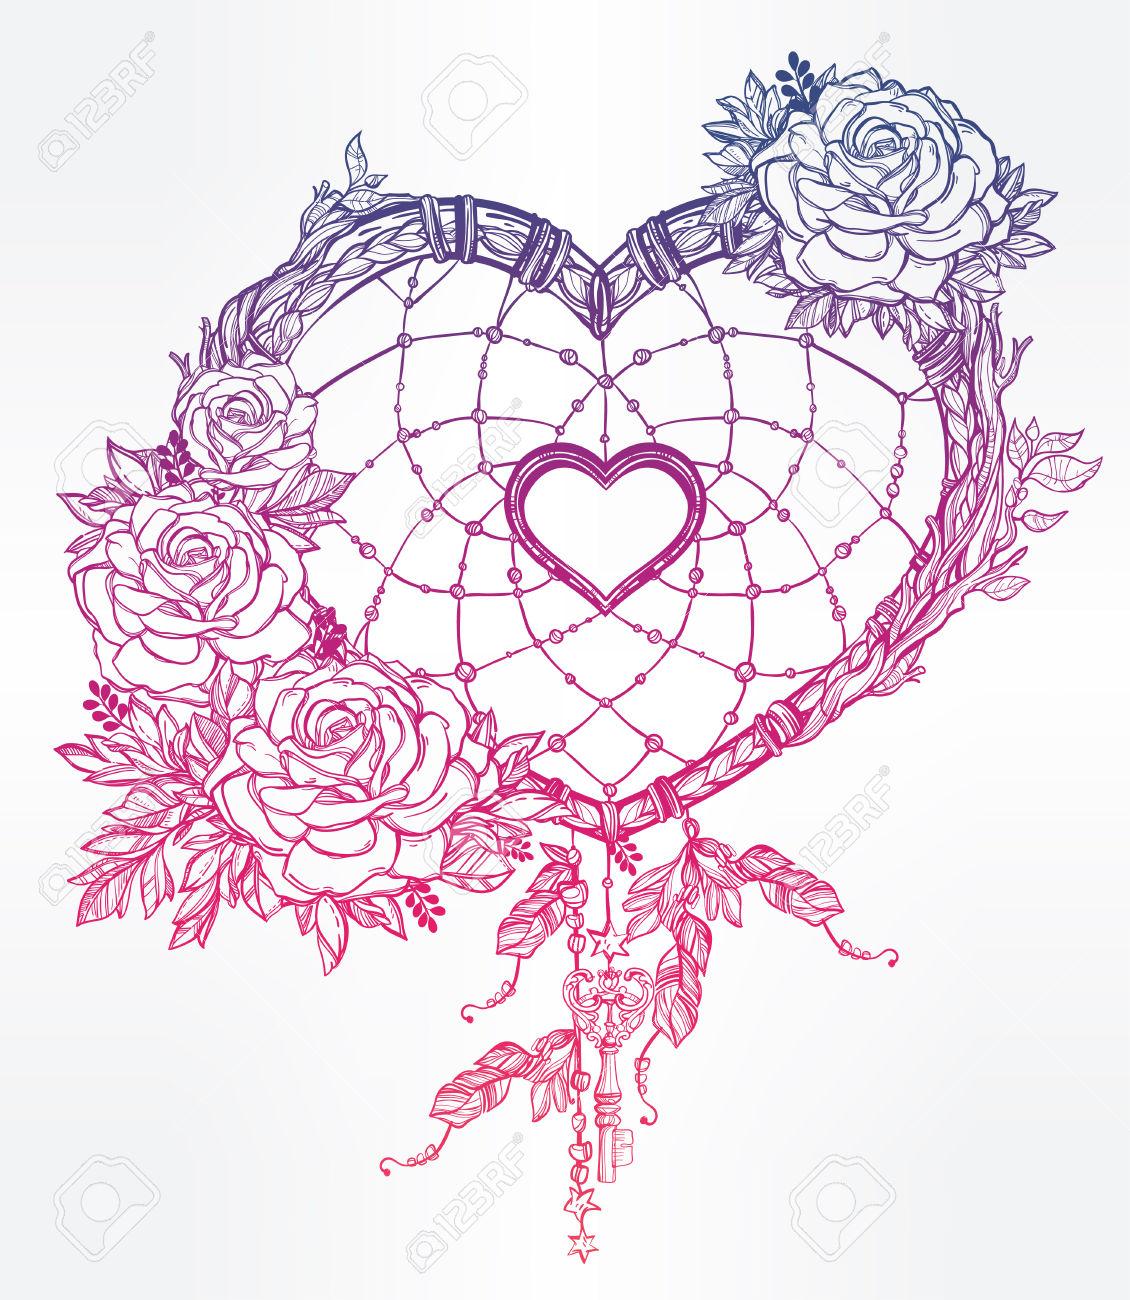 Drawn amd romantic Drawn 50928180 shaped 50928180 drawn